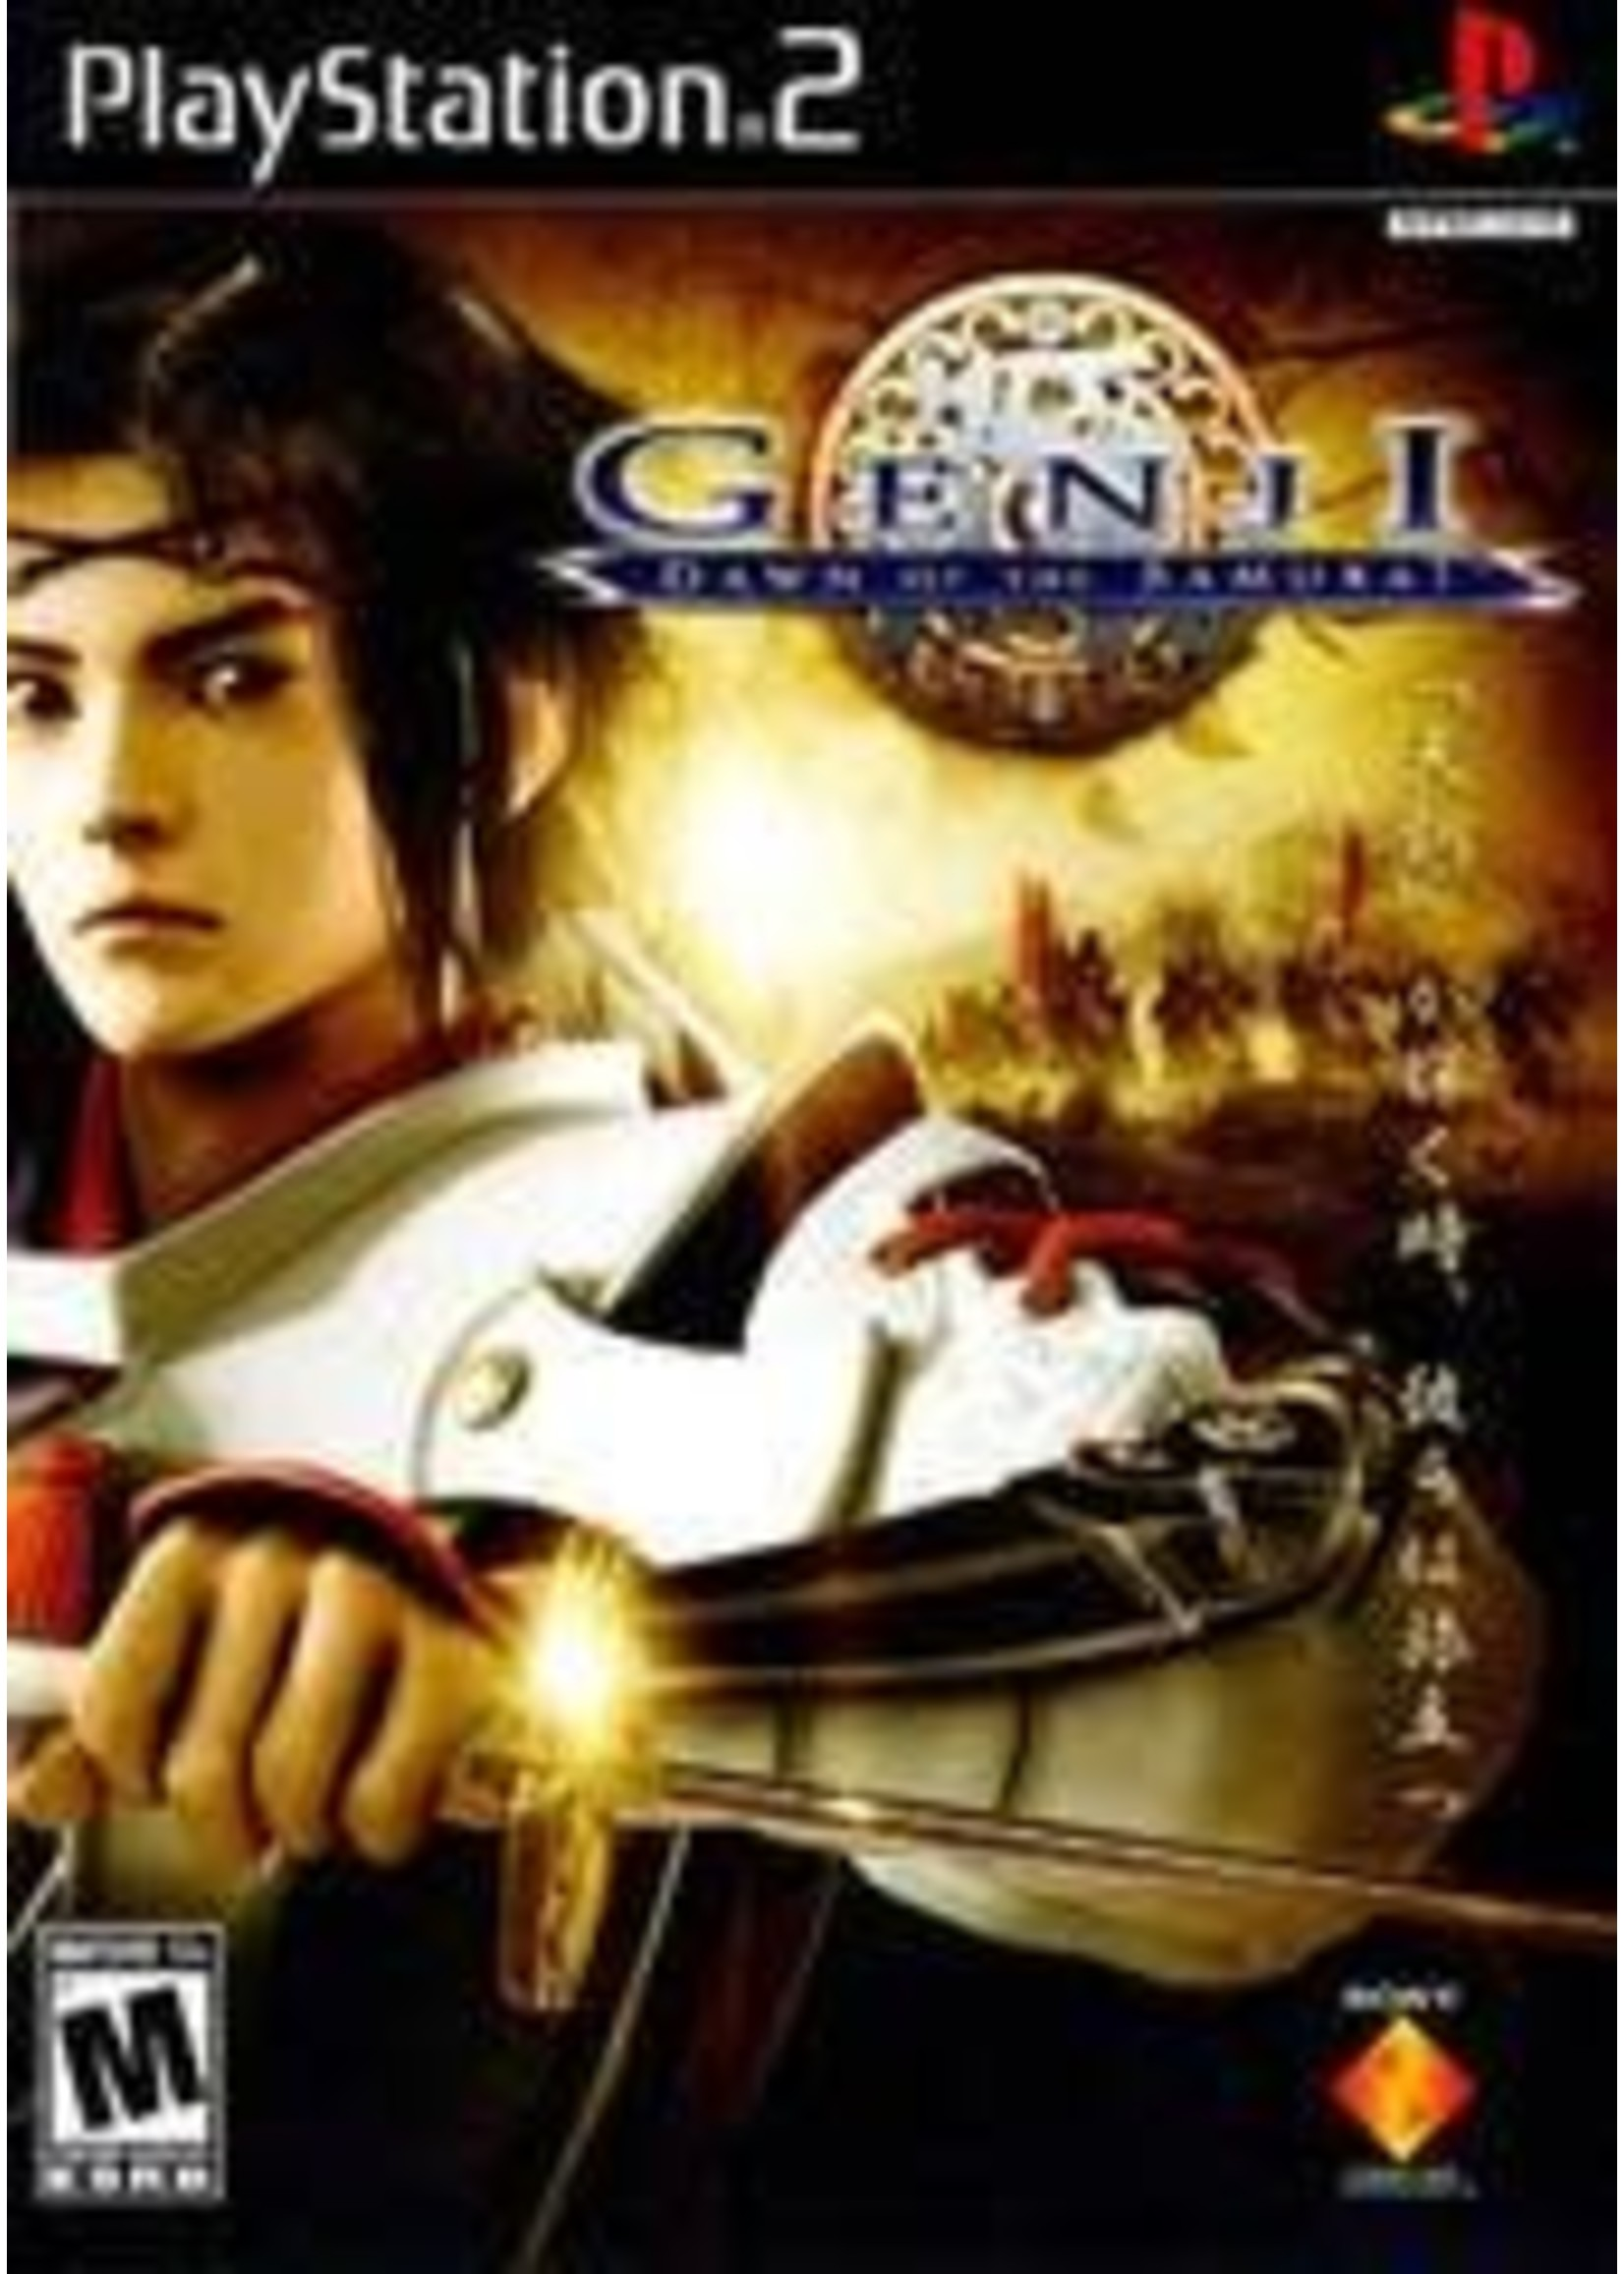 Genji Dawn Of The Samurai Playstation 2